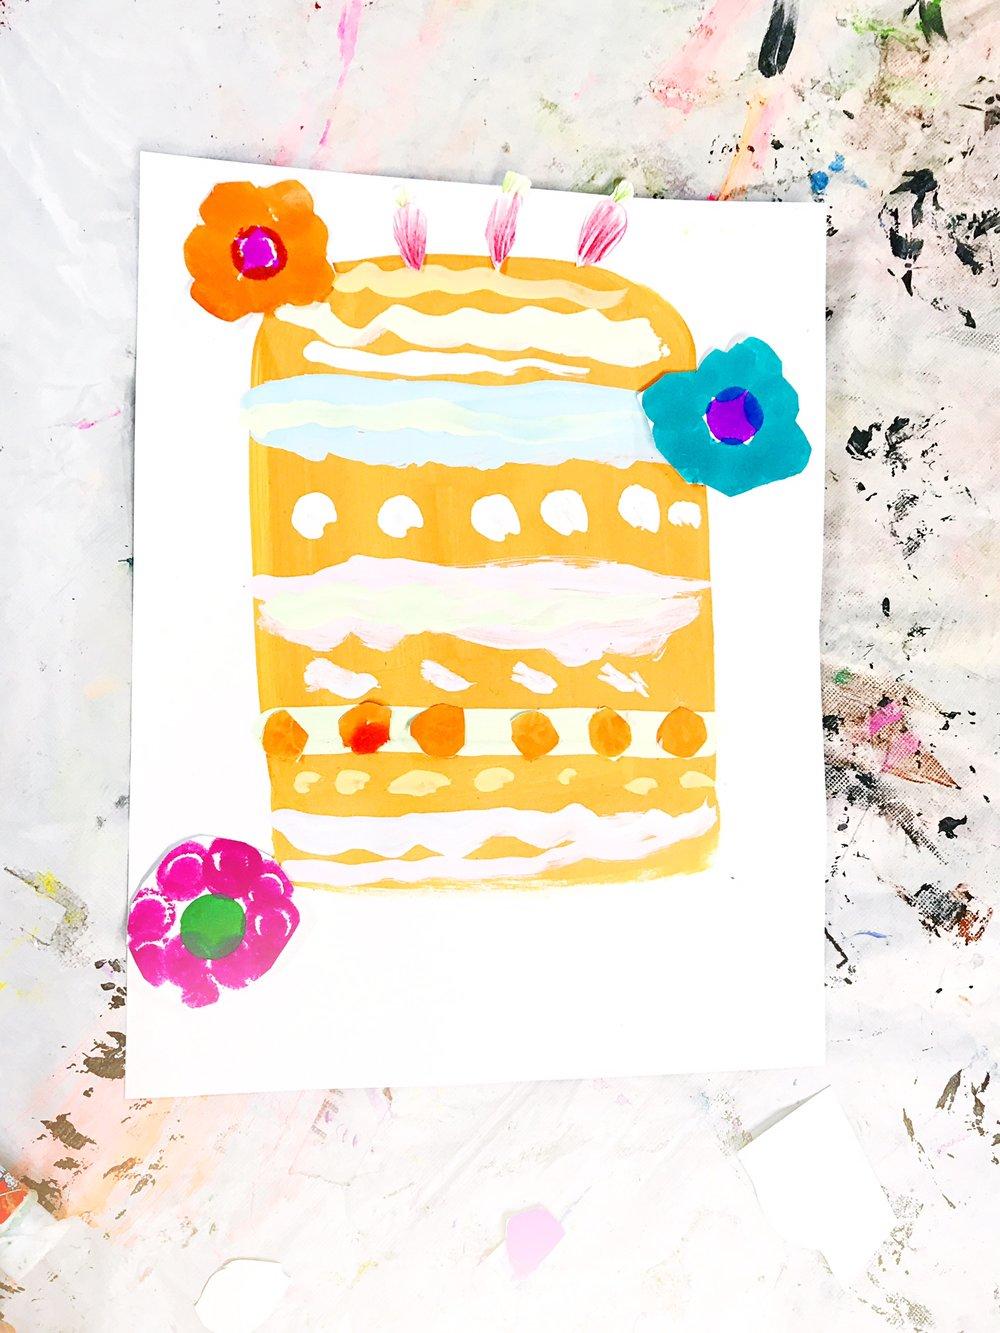 FLOWERS! Grade: 1